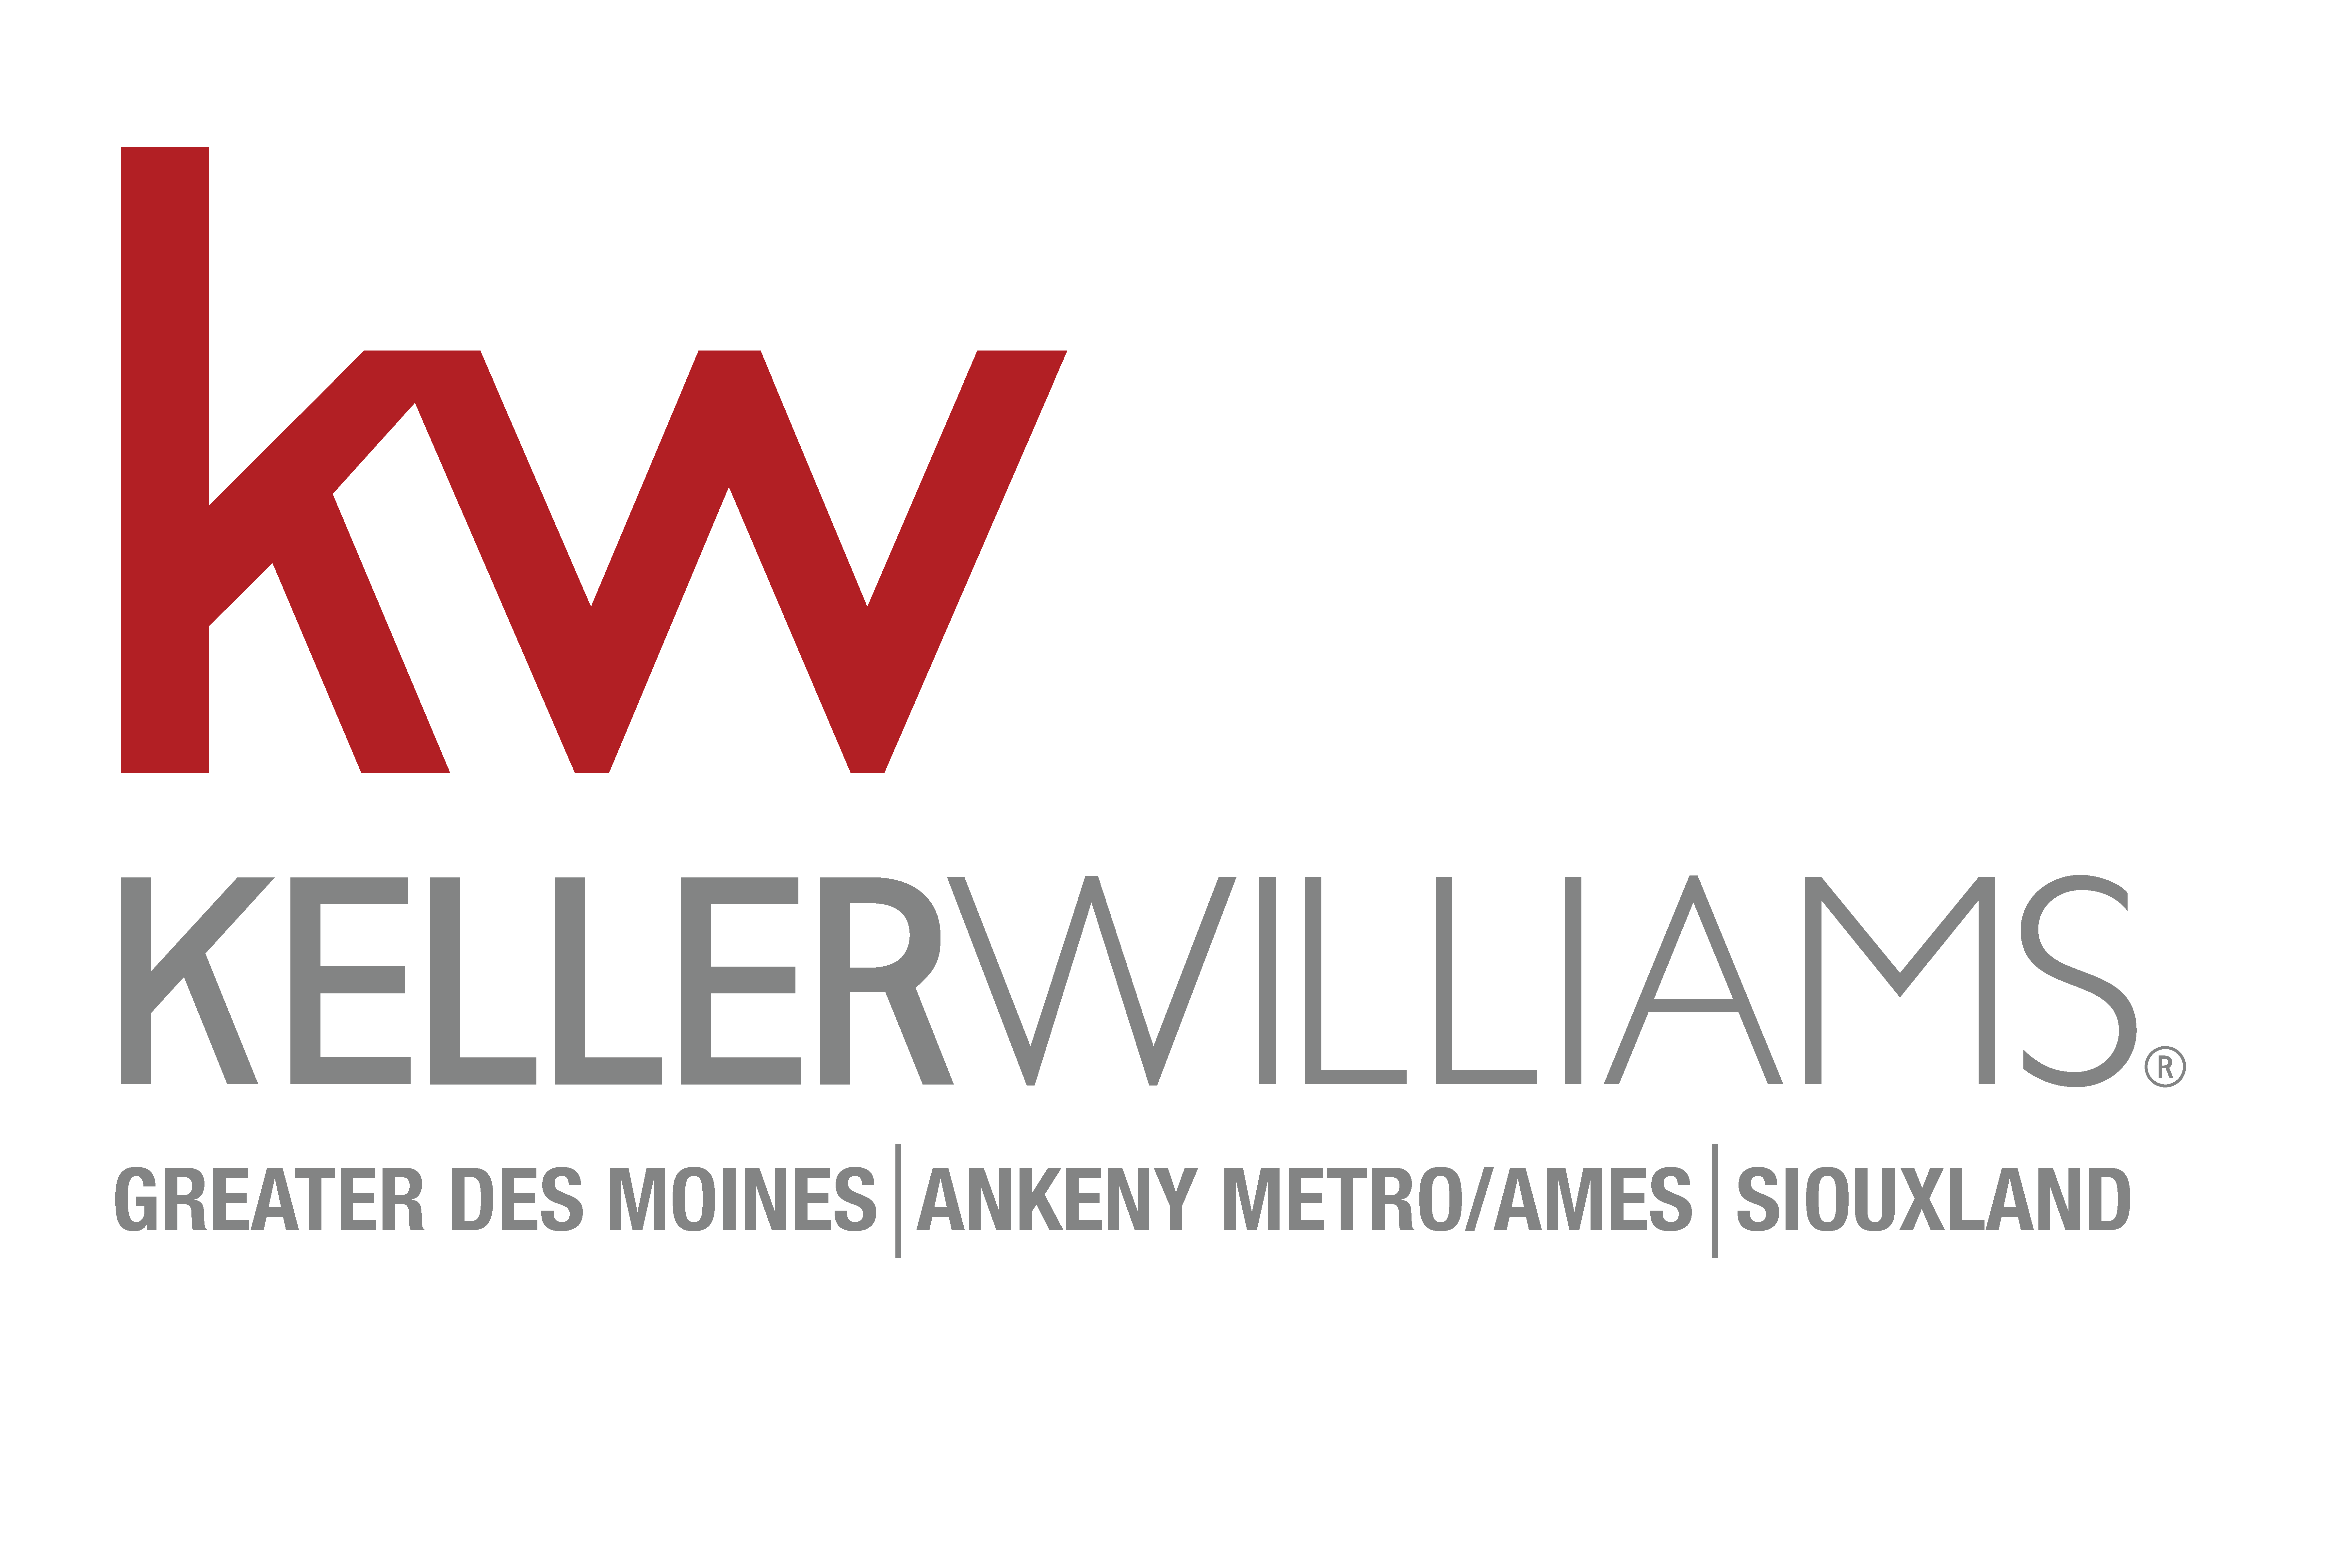 Keller Williams Greater Des Moines/Altoona/Ankeny Metro/Ames/Alliance (Clear Lake)/Siouxland logo